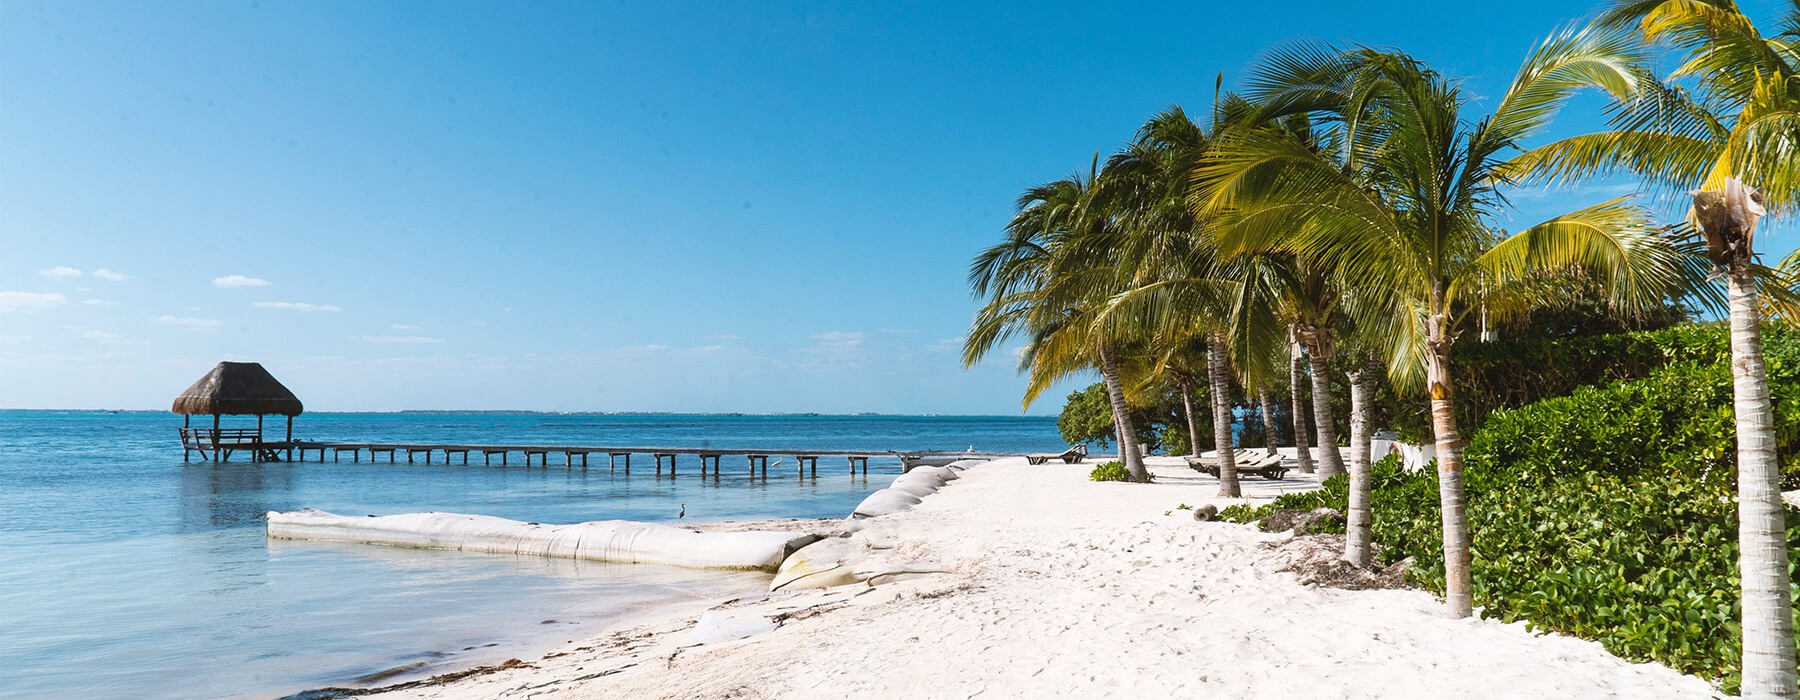 transfer-airport-cancun